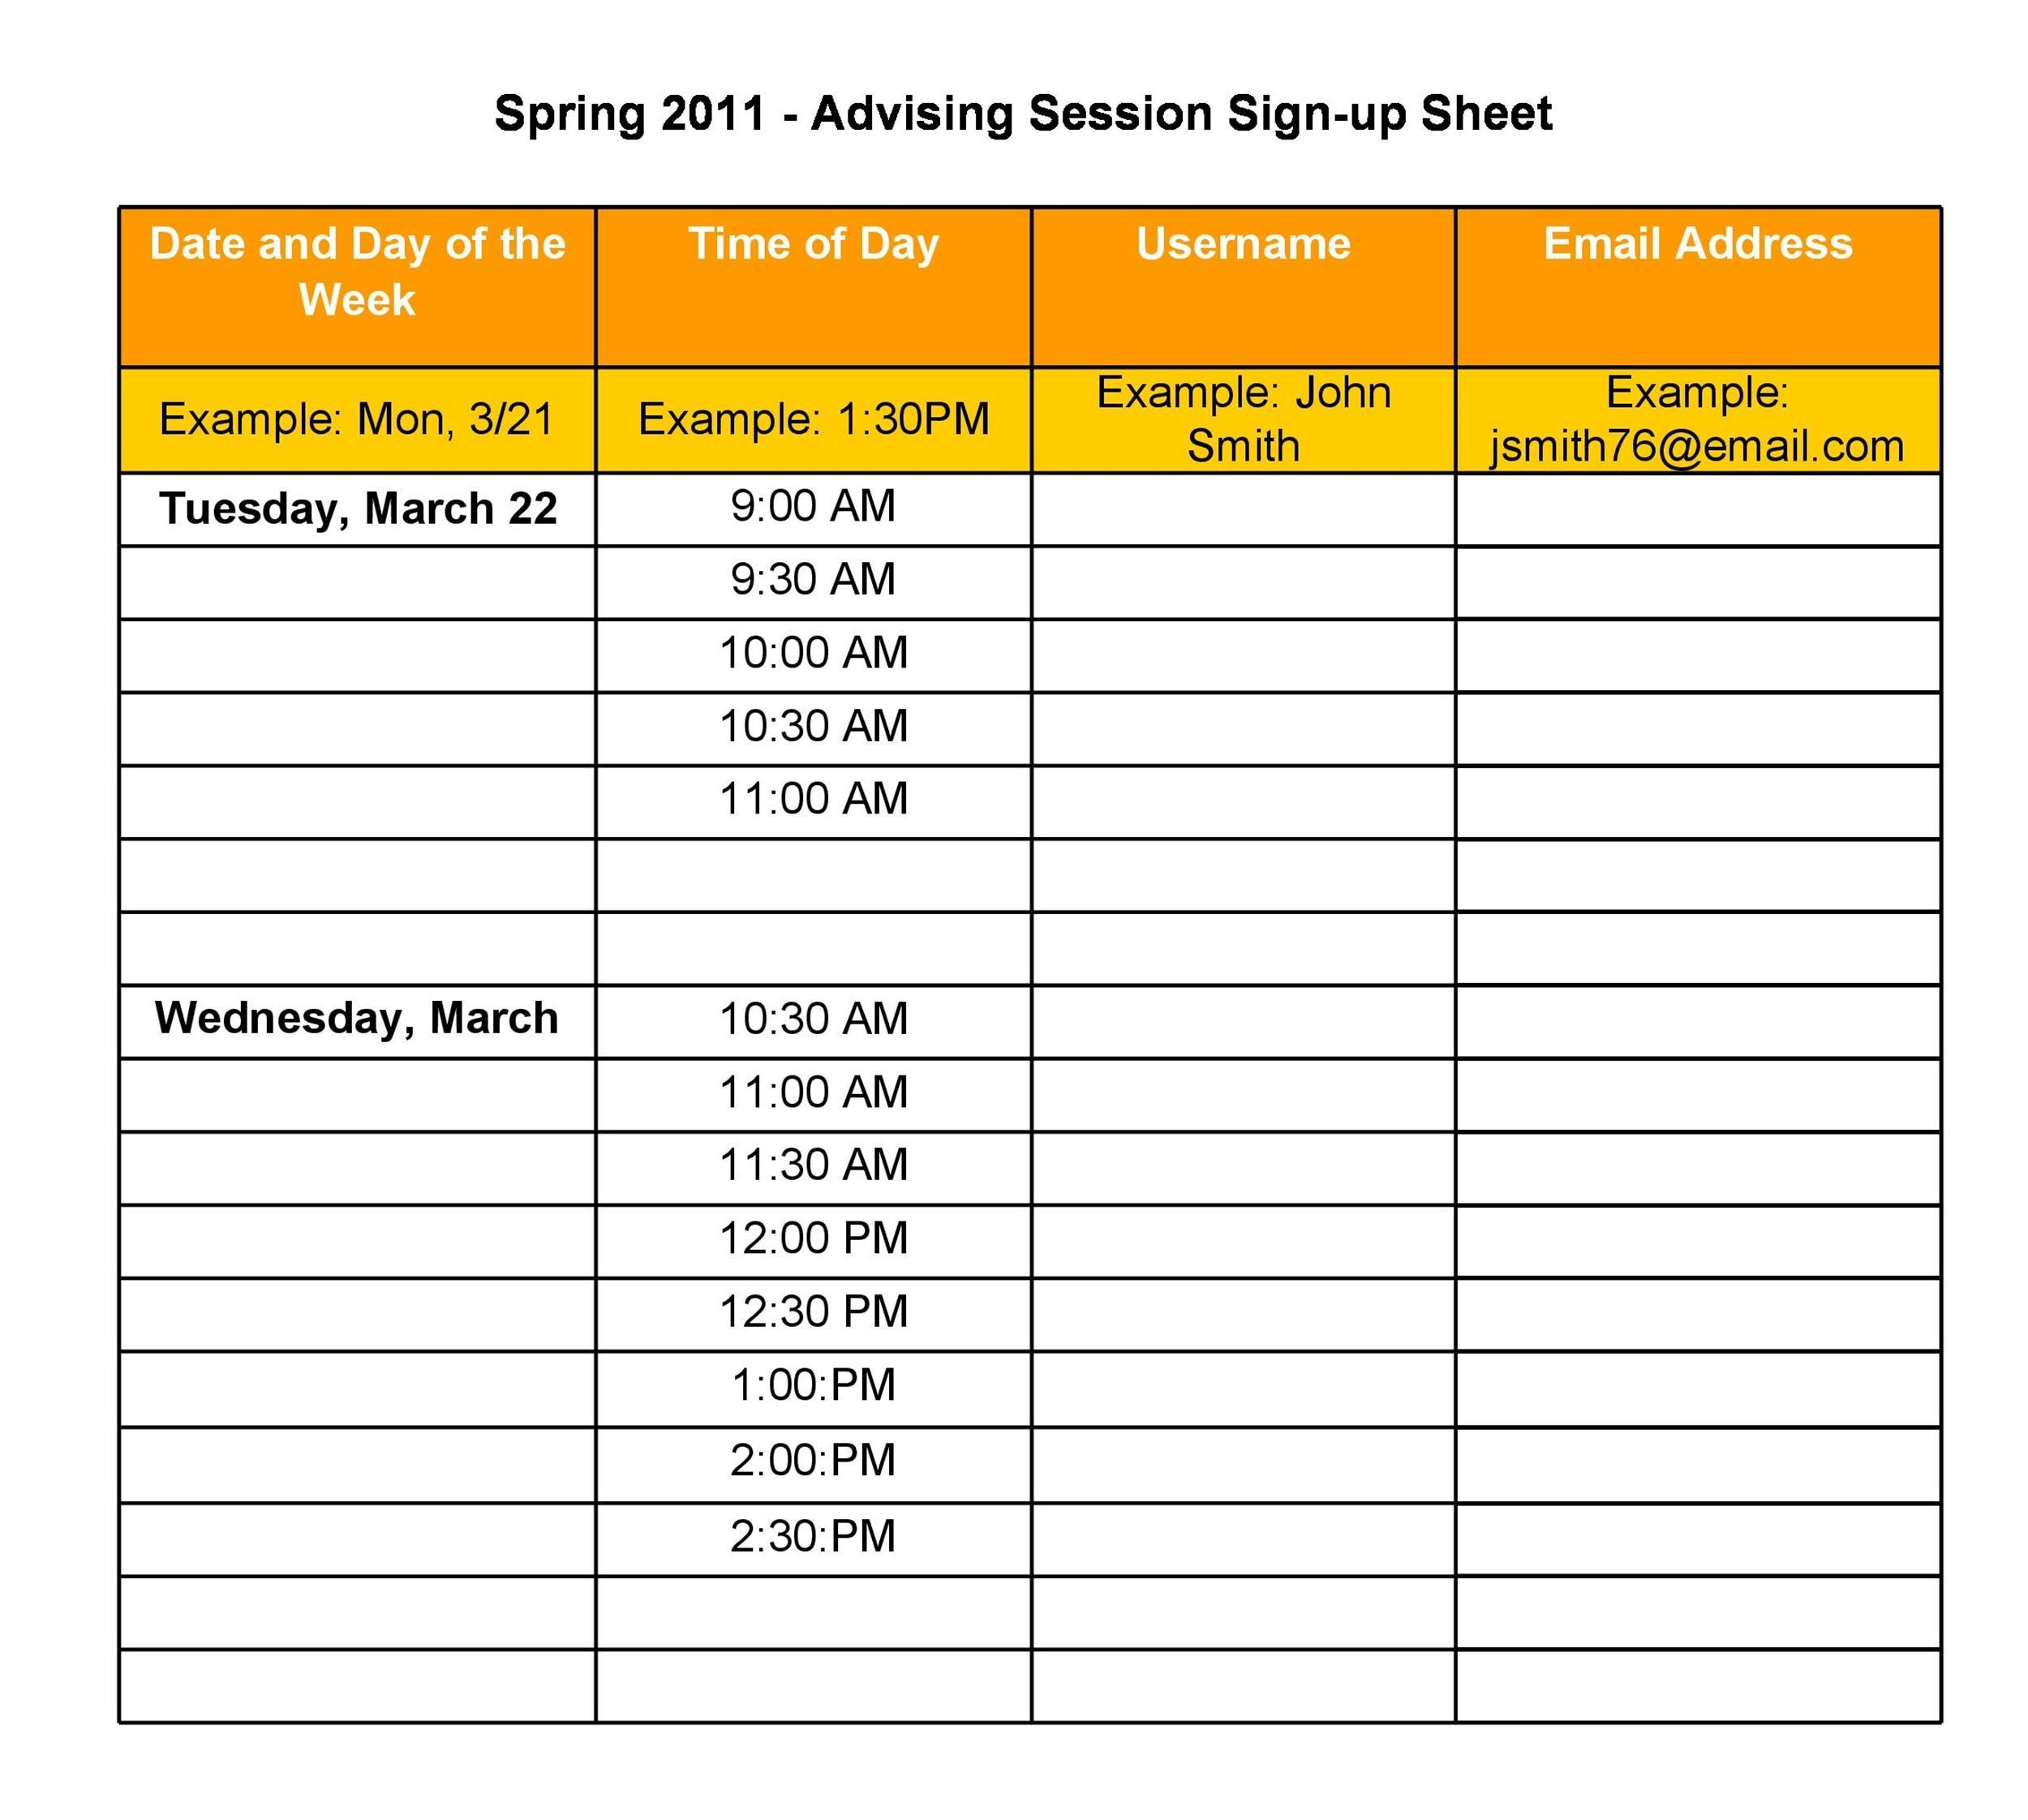 Potluck List Template sign up sheets potluck sign up sheet free – Simple Sign Up Sheet Template